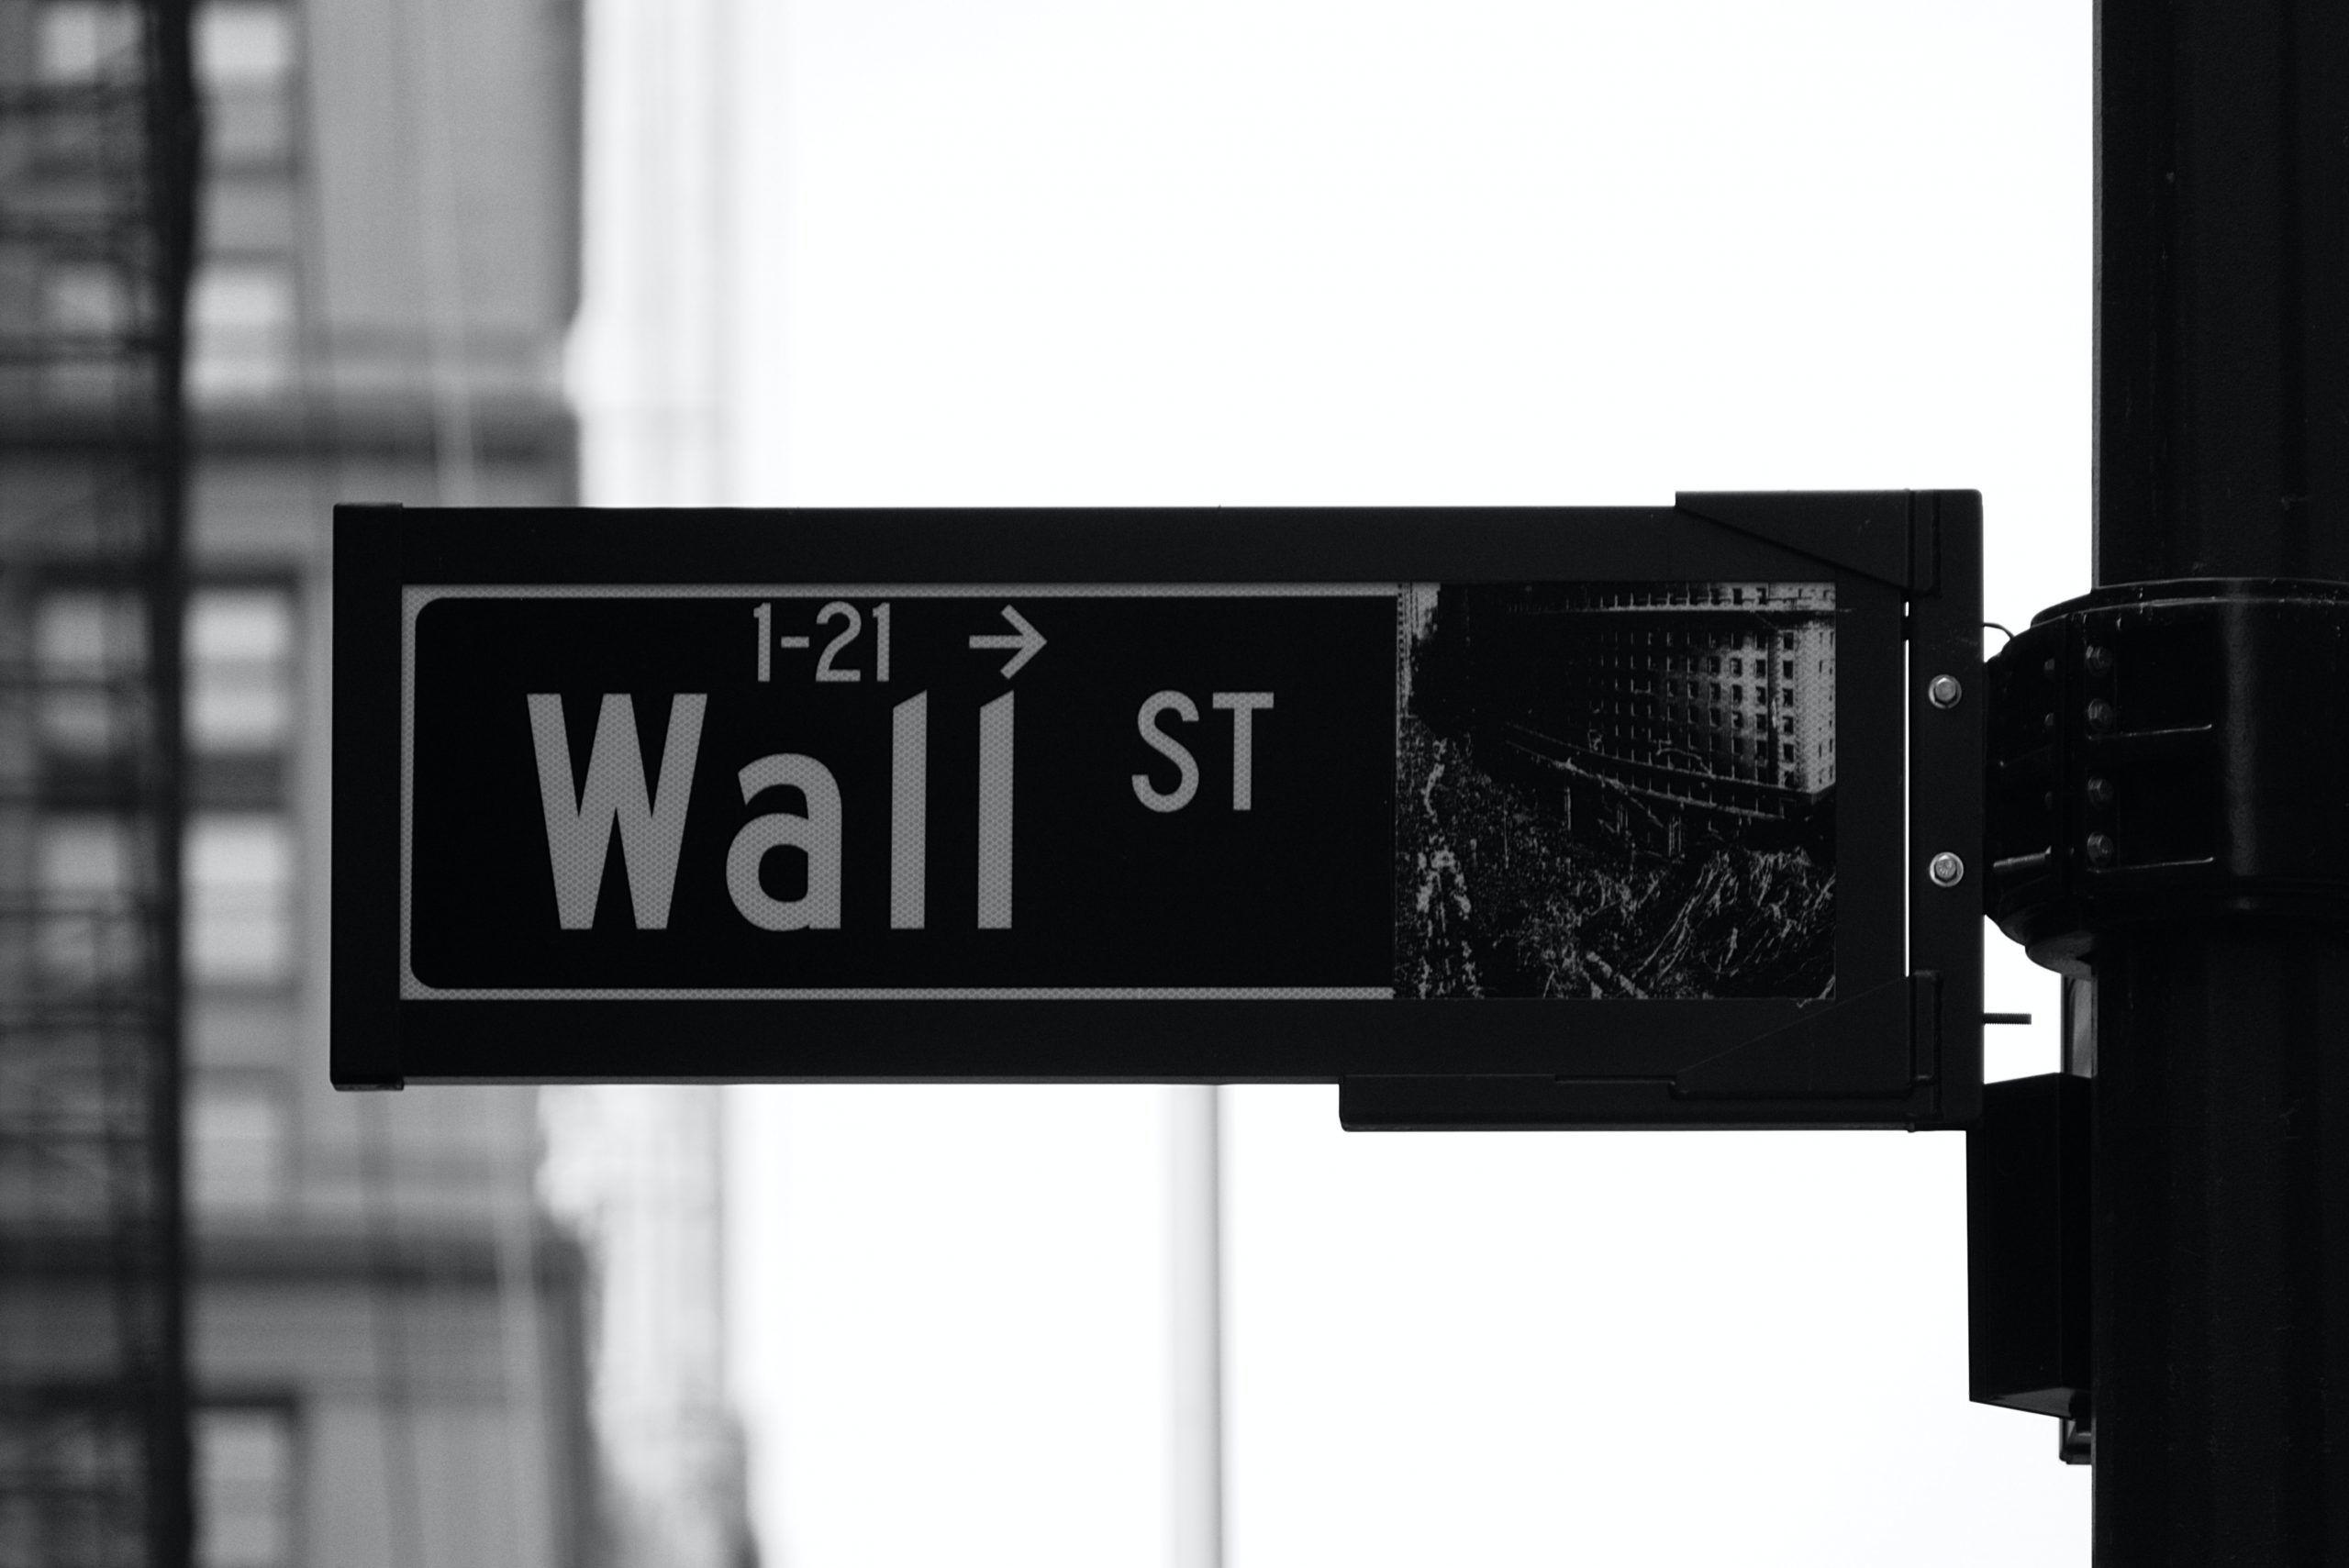 wall-street-news-call-put-strike-finance